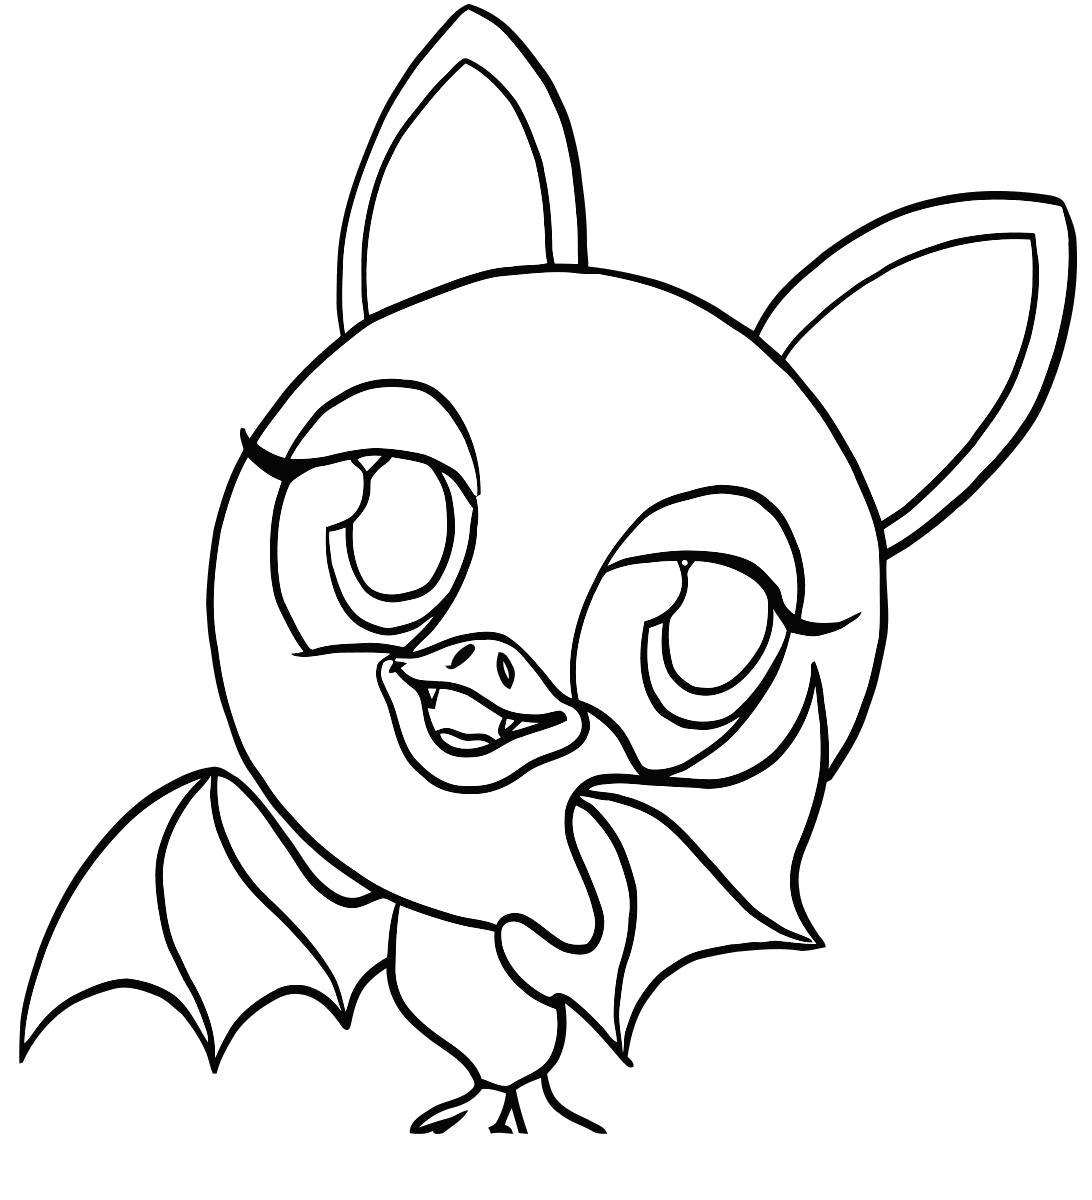 Раскраска летучая мышка. Скачать зублс.  Распечатать зублс